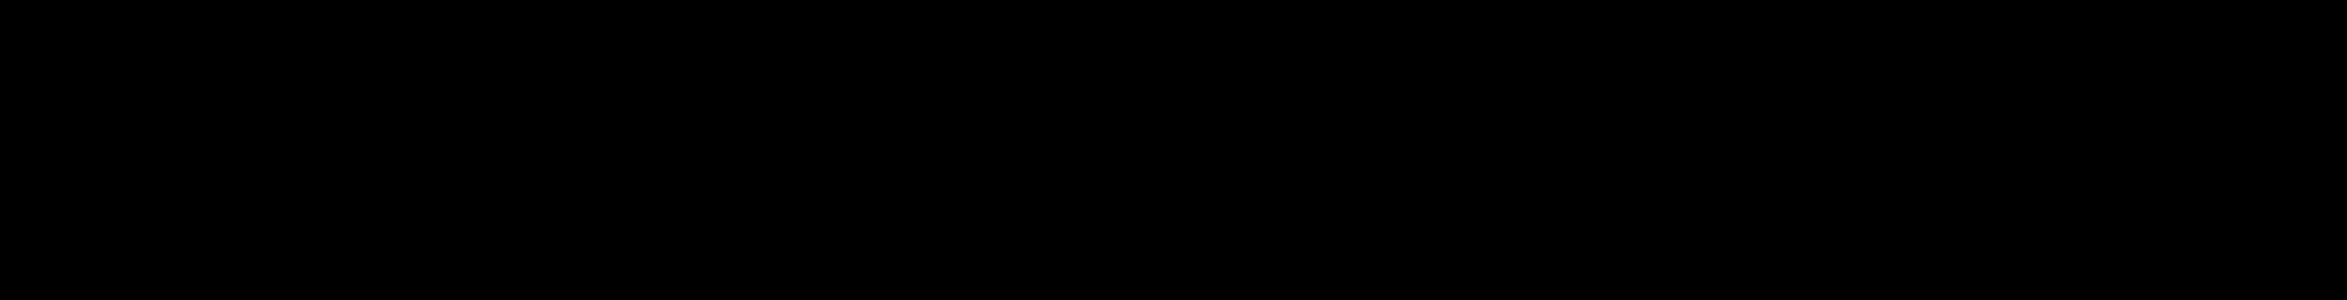 Хронотека